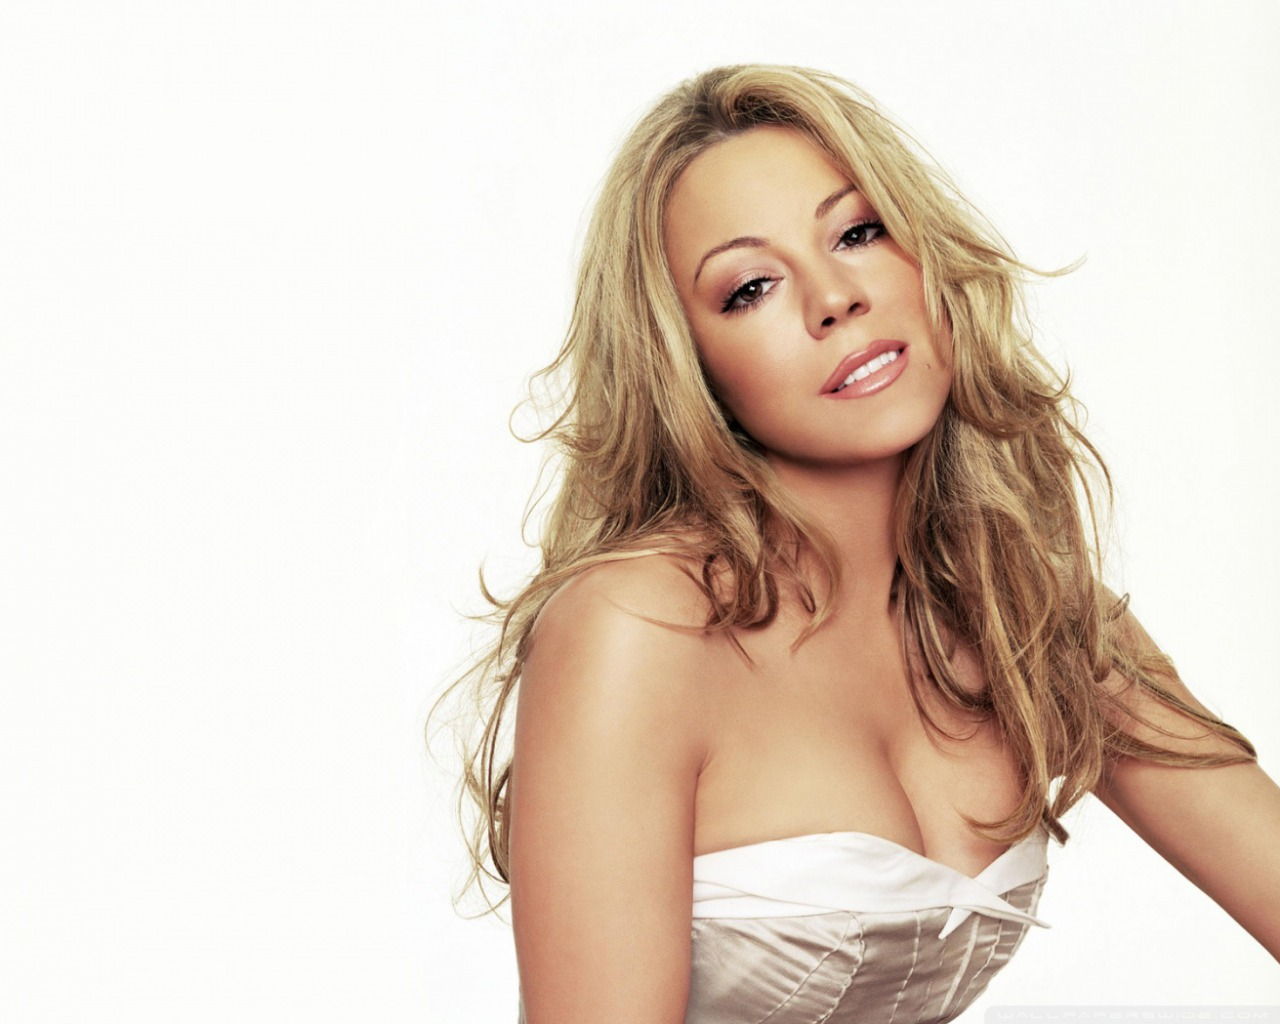 http://2.bp.blogspot.com/-BUeJGJqfnGQ/UPlLTwOMJZI/AAAAAAAACaE/QKUEVBAO8sM/s1600/Celebrity+HD+HairStyle+Wallpapers+8.jpg